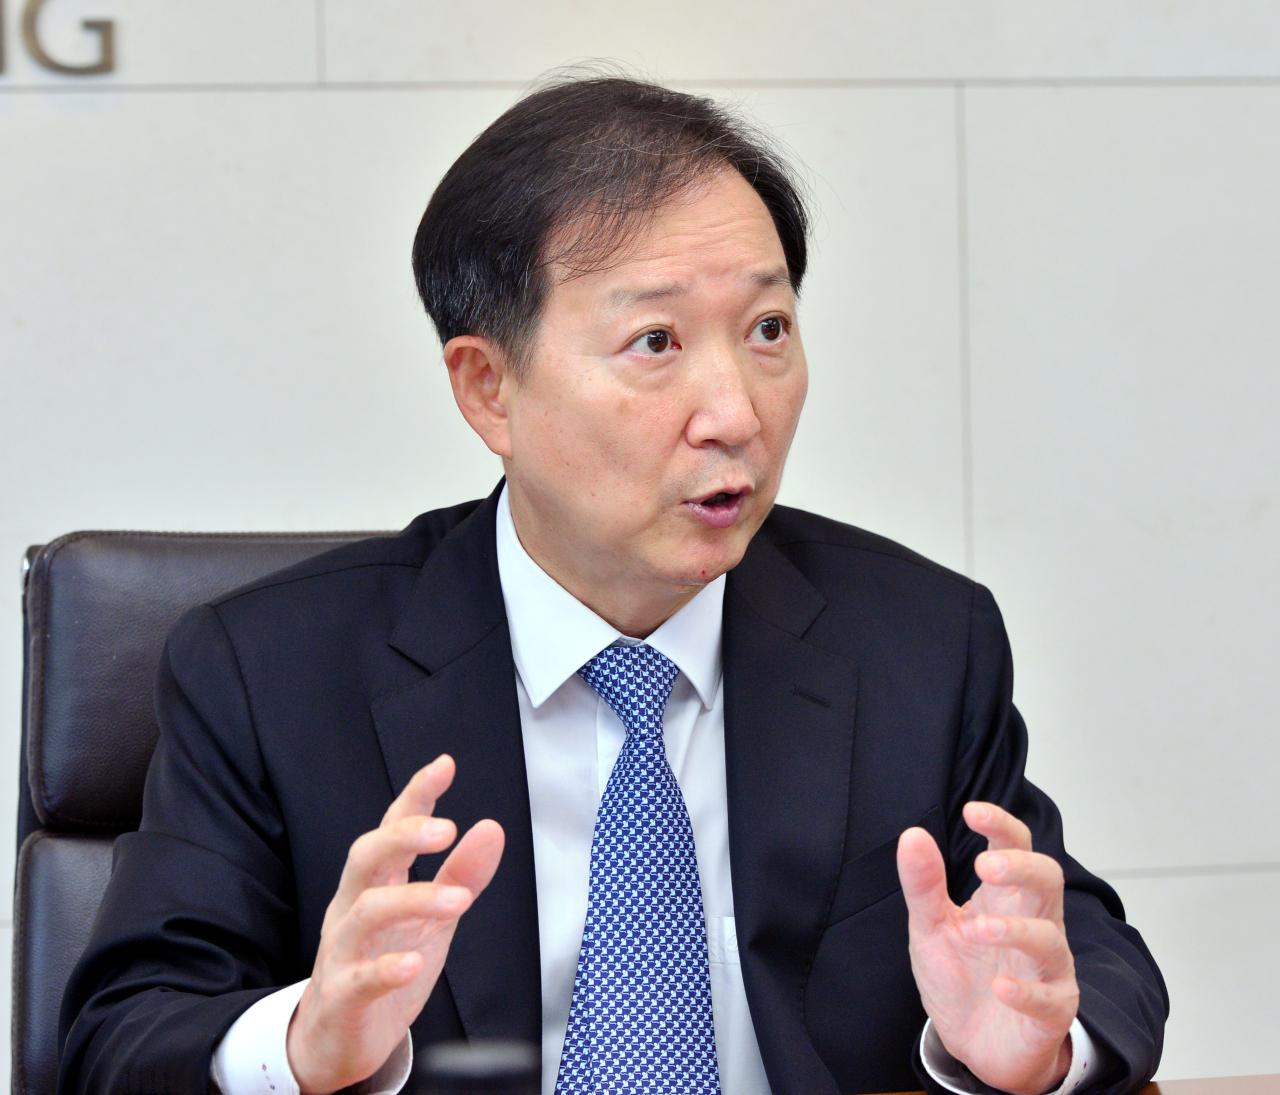 Yoon & Yang Managing Partner Jeong Jin-su speaks during an interview with The Korea Herald. (Park Hyun-koo/The Korea Herald)